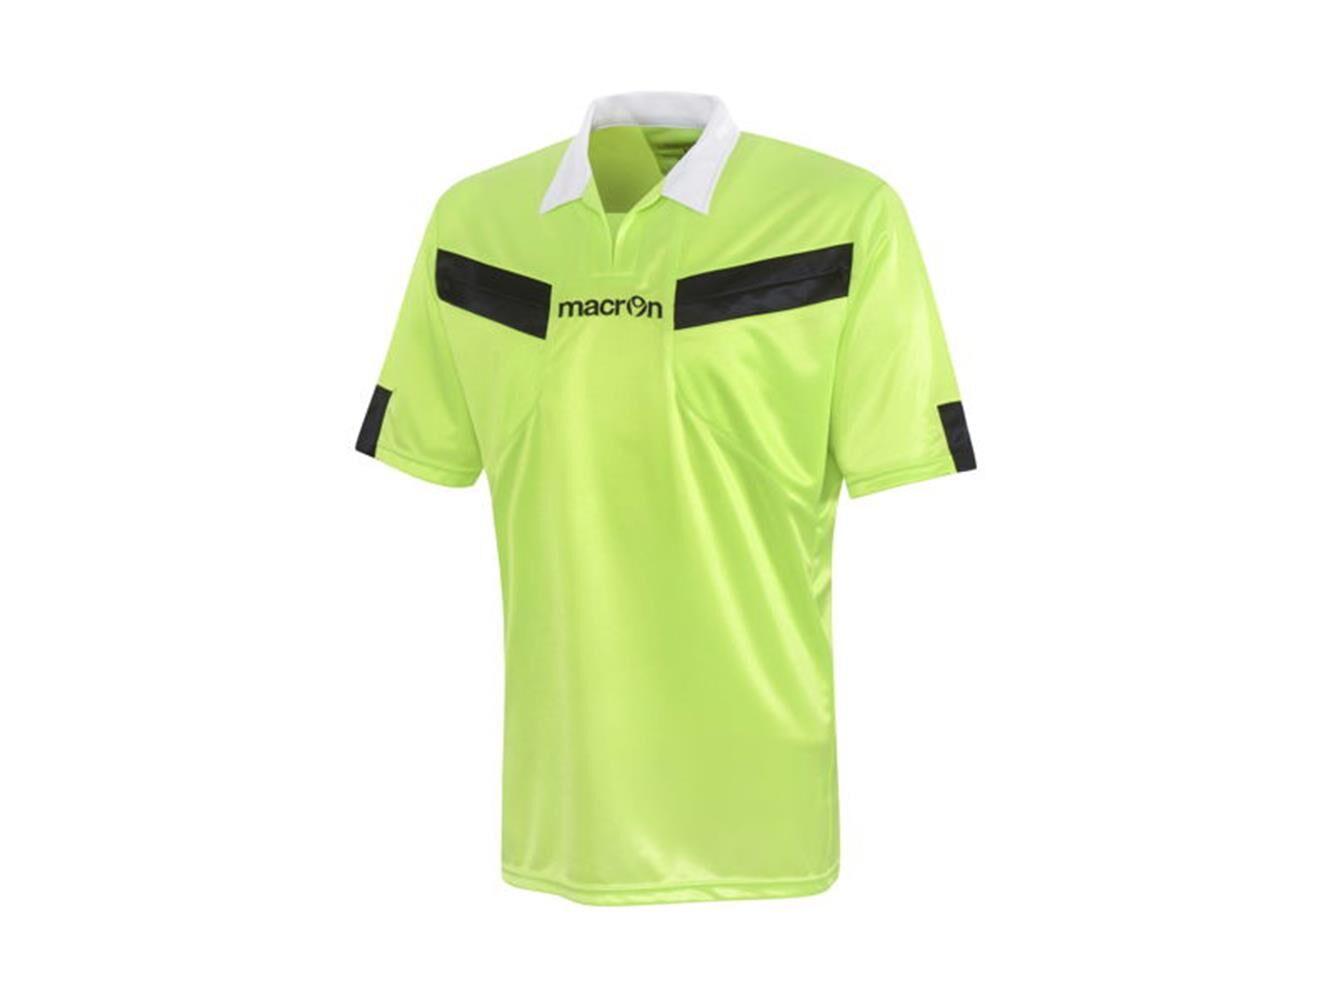 Macron T-Shirt Arbitro Calcio Manica Corta Macron Referee